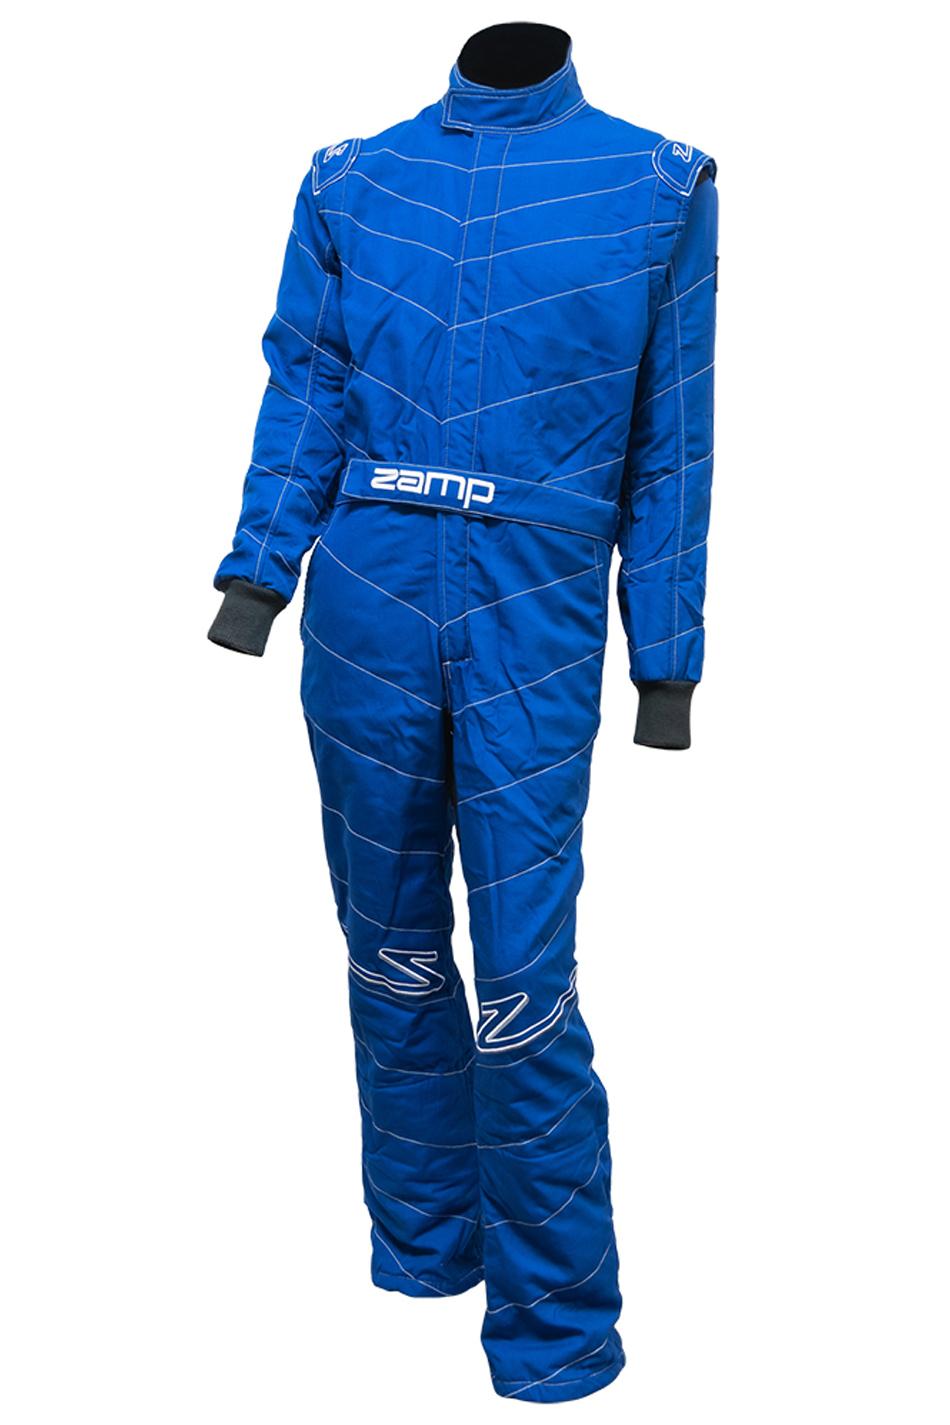 Zamp R040004XL Suit, ZR-50, 1 Piece, SFI 3.2A/5, Triple Layer, Fire Retardant Fabric, Blue, X-Large, Each